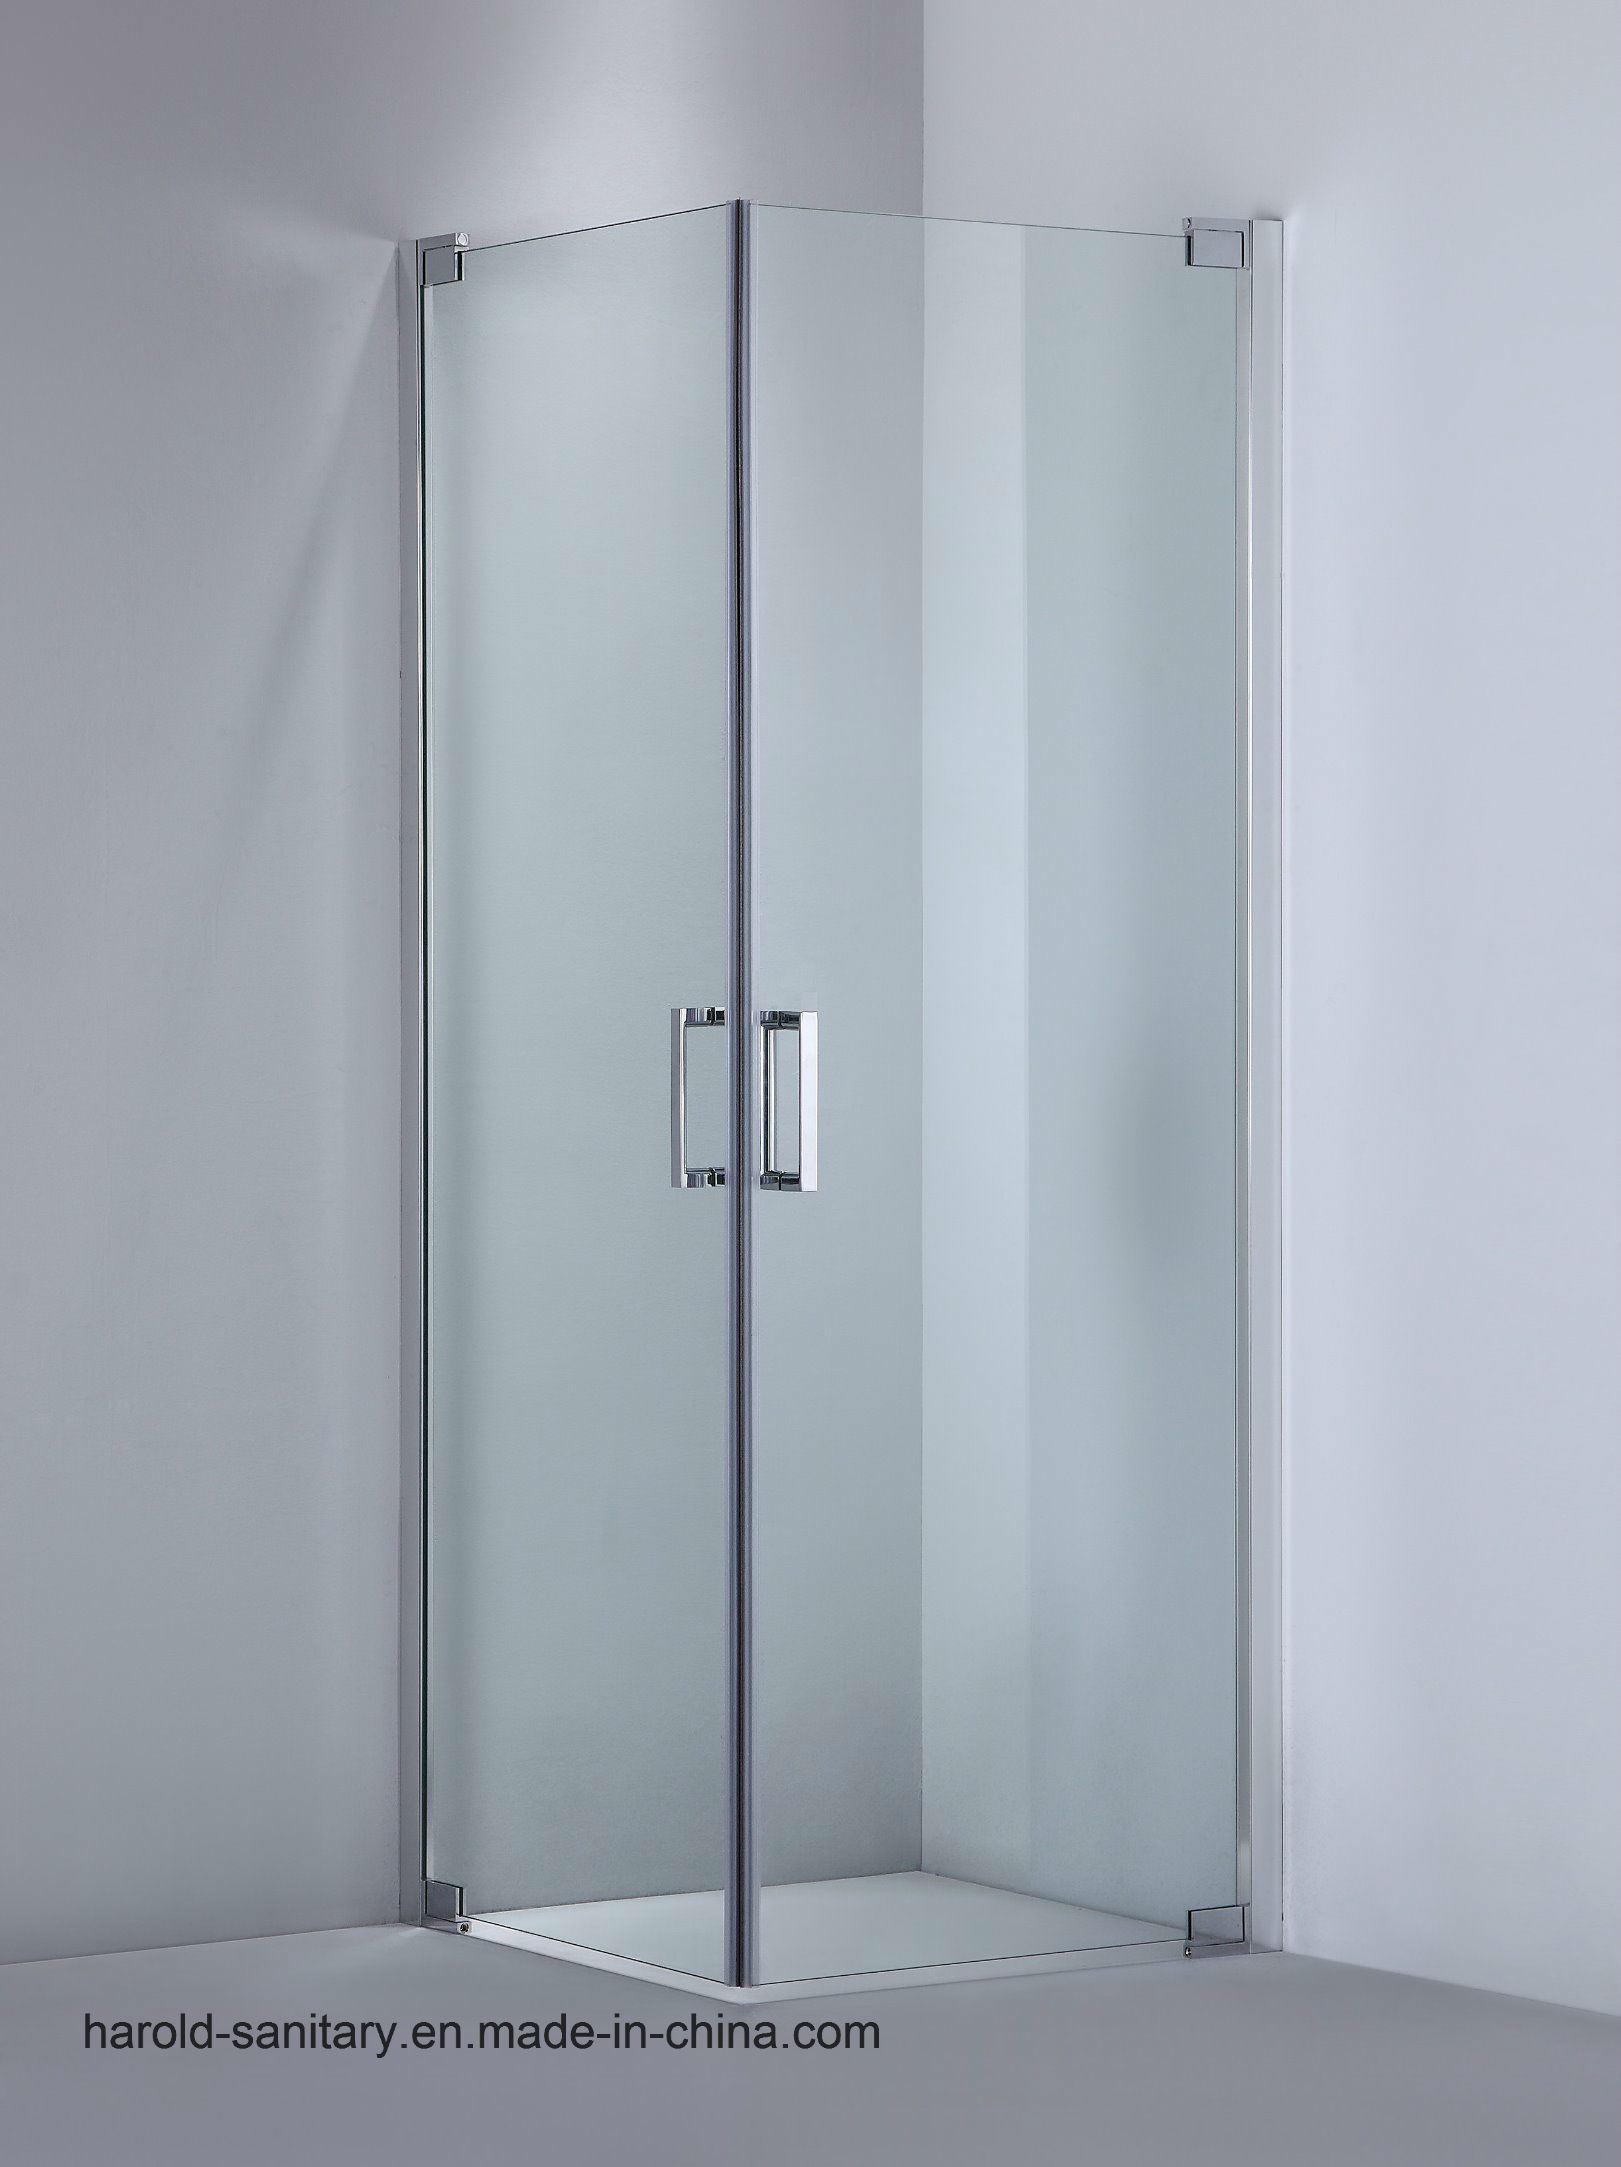 China Frameless Glass Shower Enclosure 2 Doors Swing China